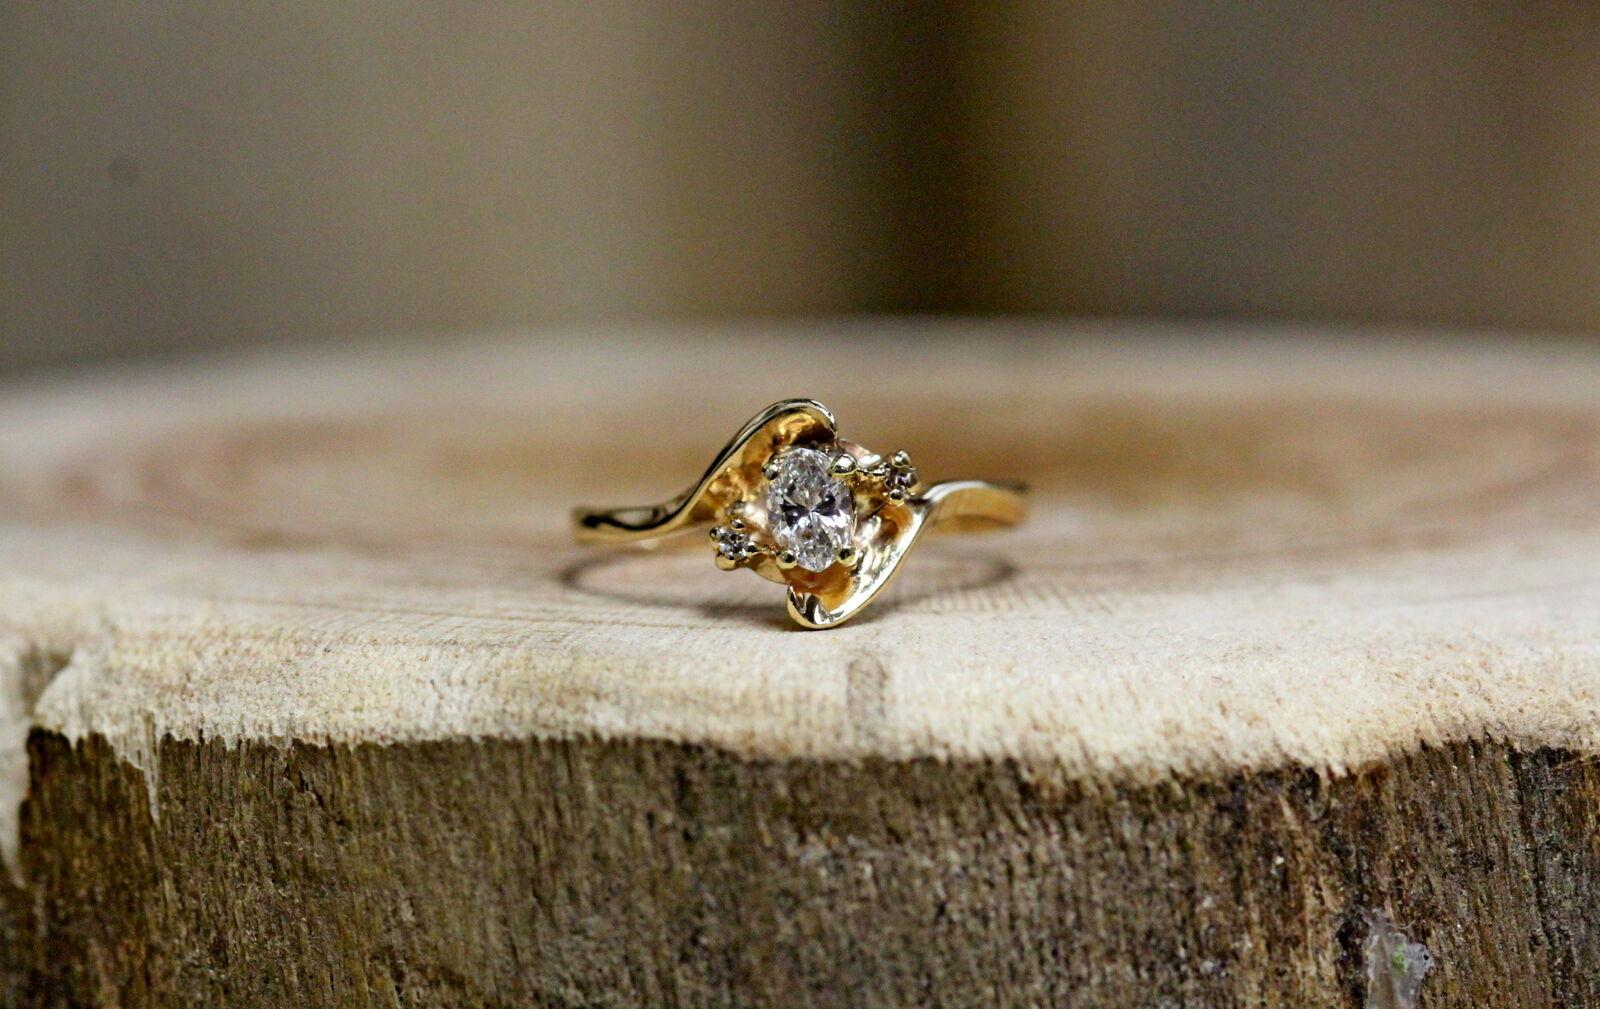 10Kt Yellow gold Diamond Ring Size 6.5